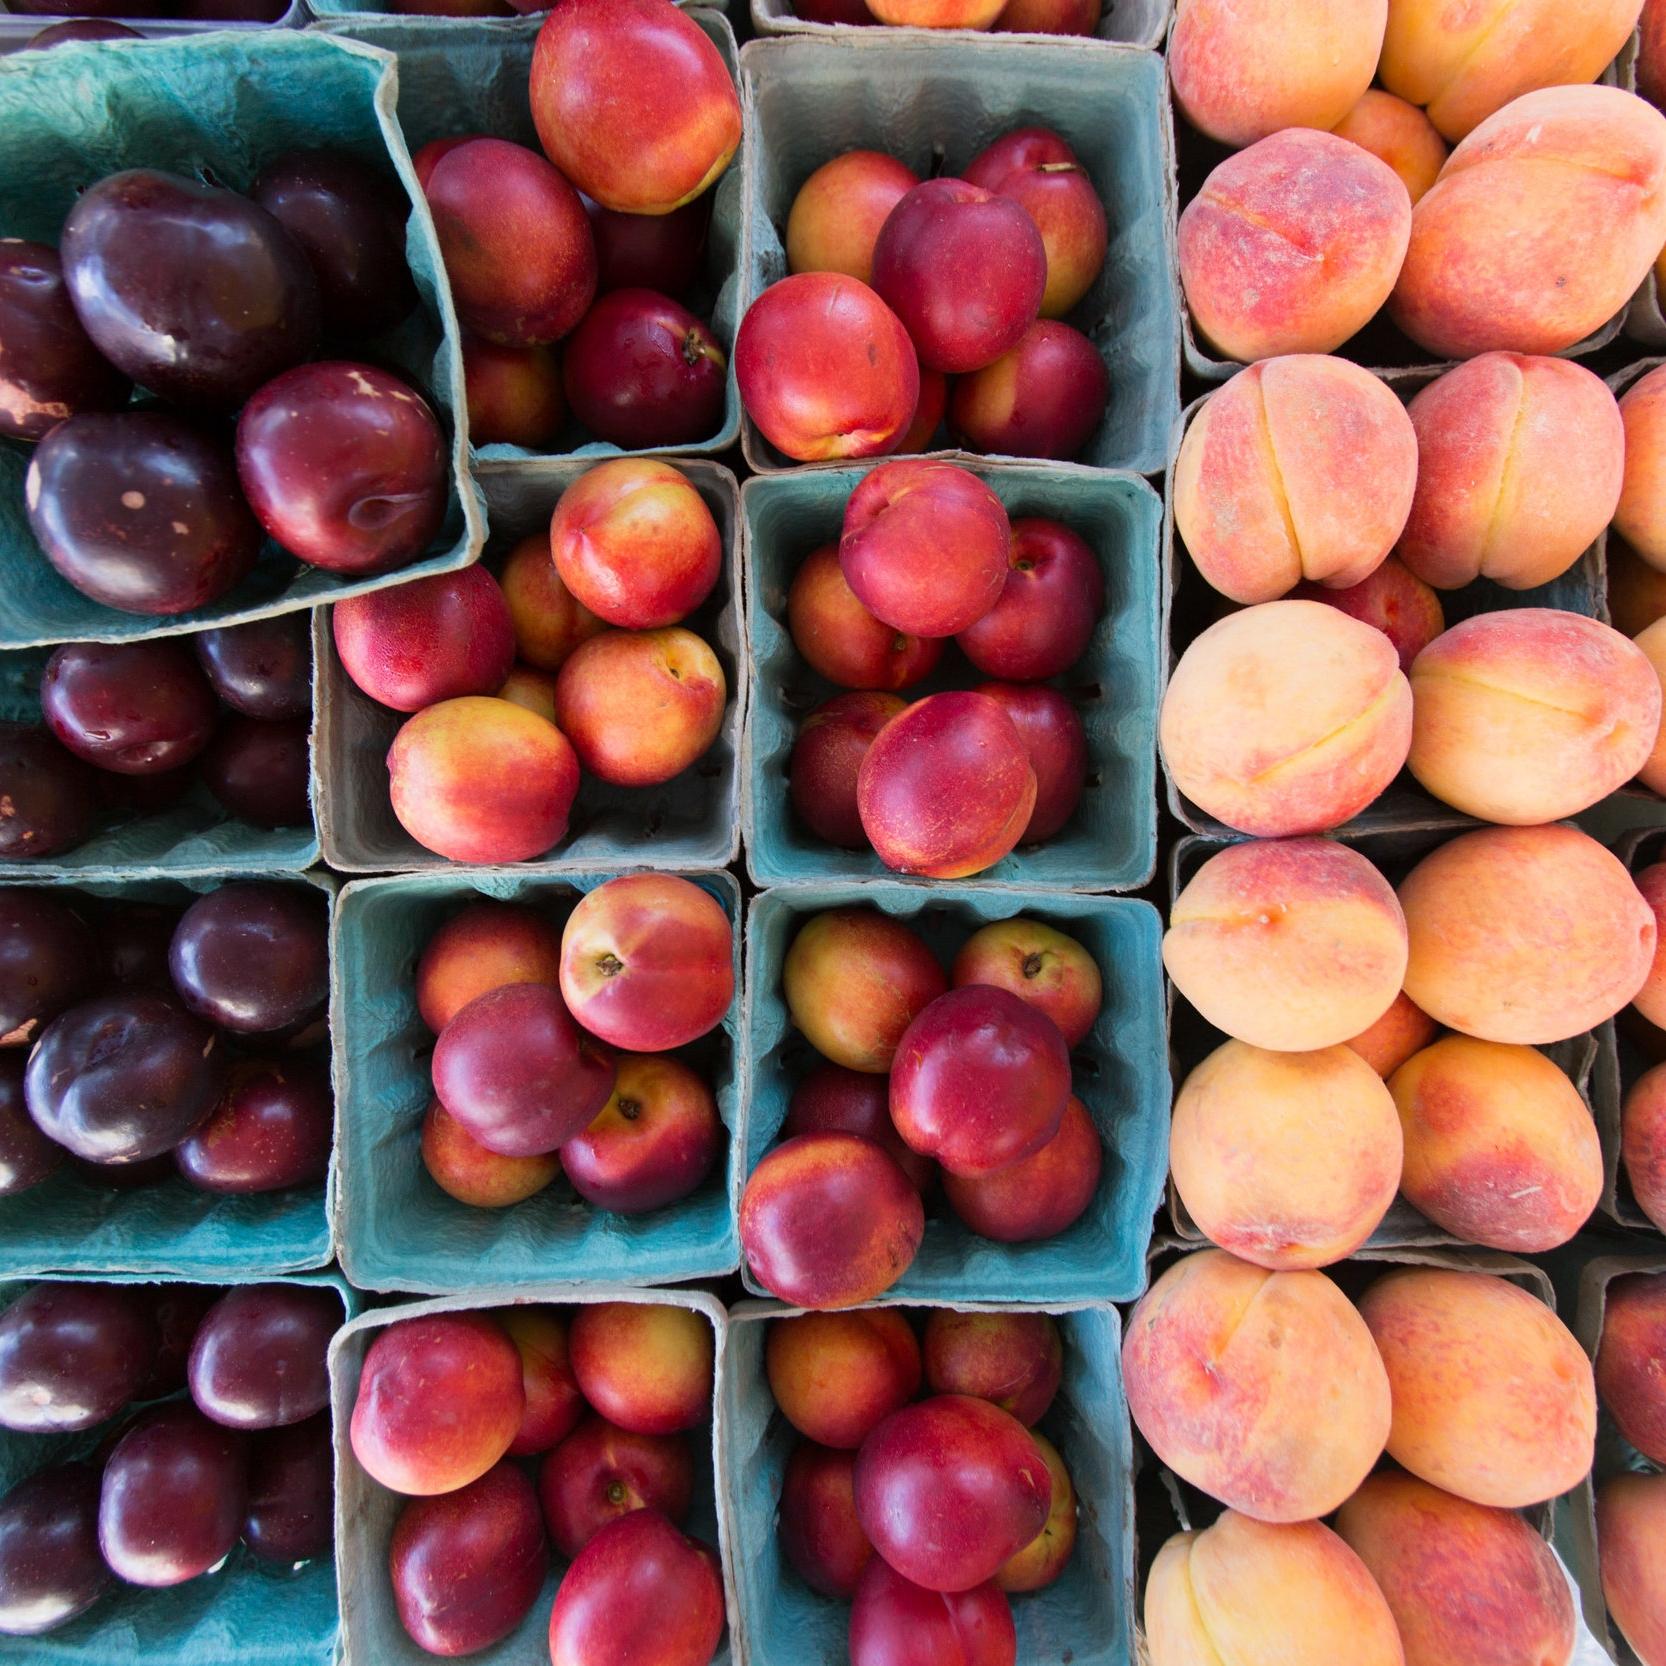 DC Greens Links Communities to Healthy Foods, NBC4